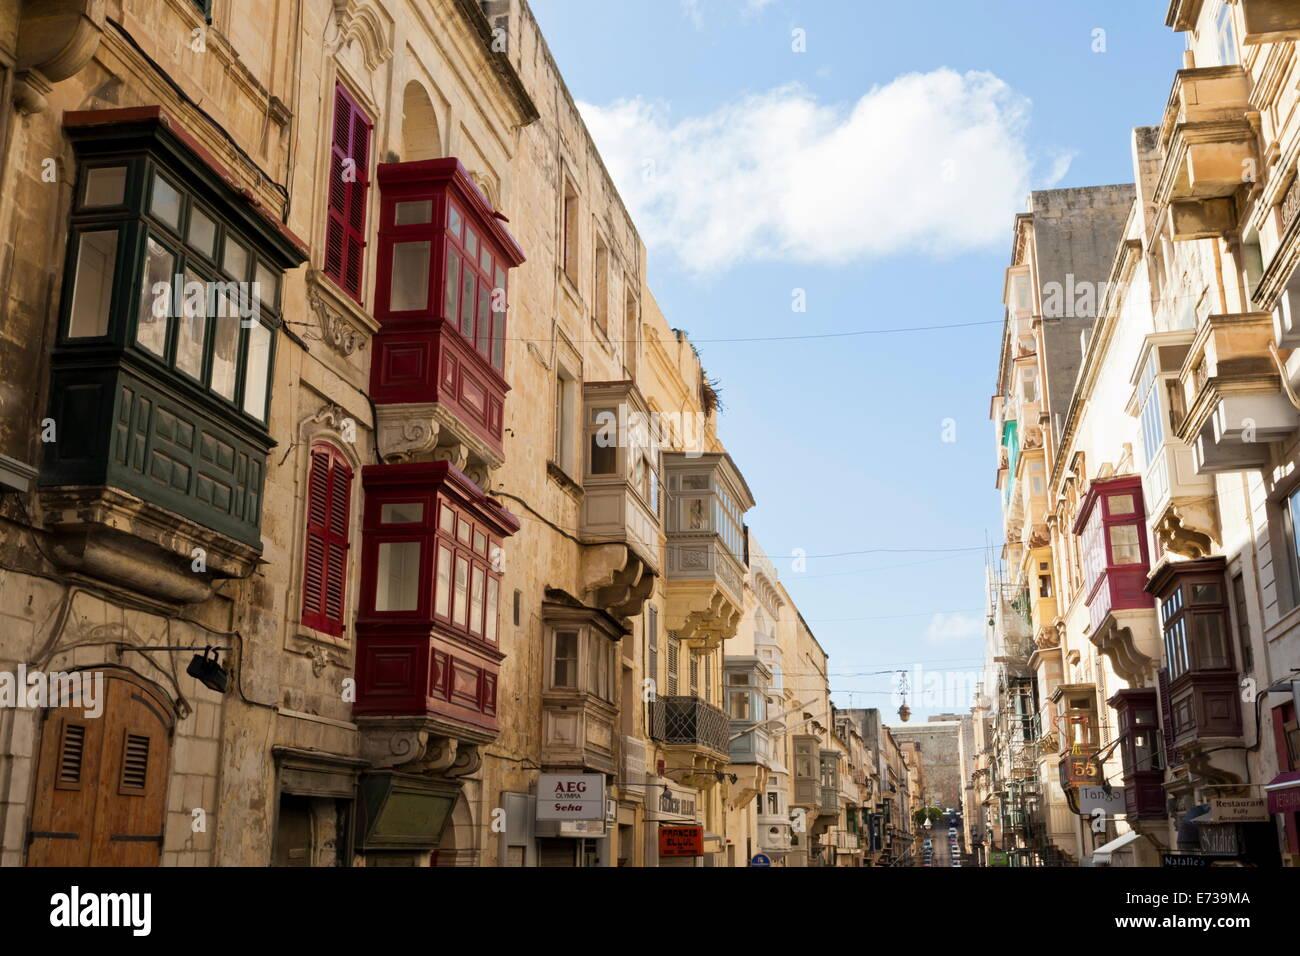 Maltese balconies in the old town, Valletta, Malta, Europe - Stock Image